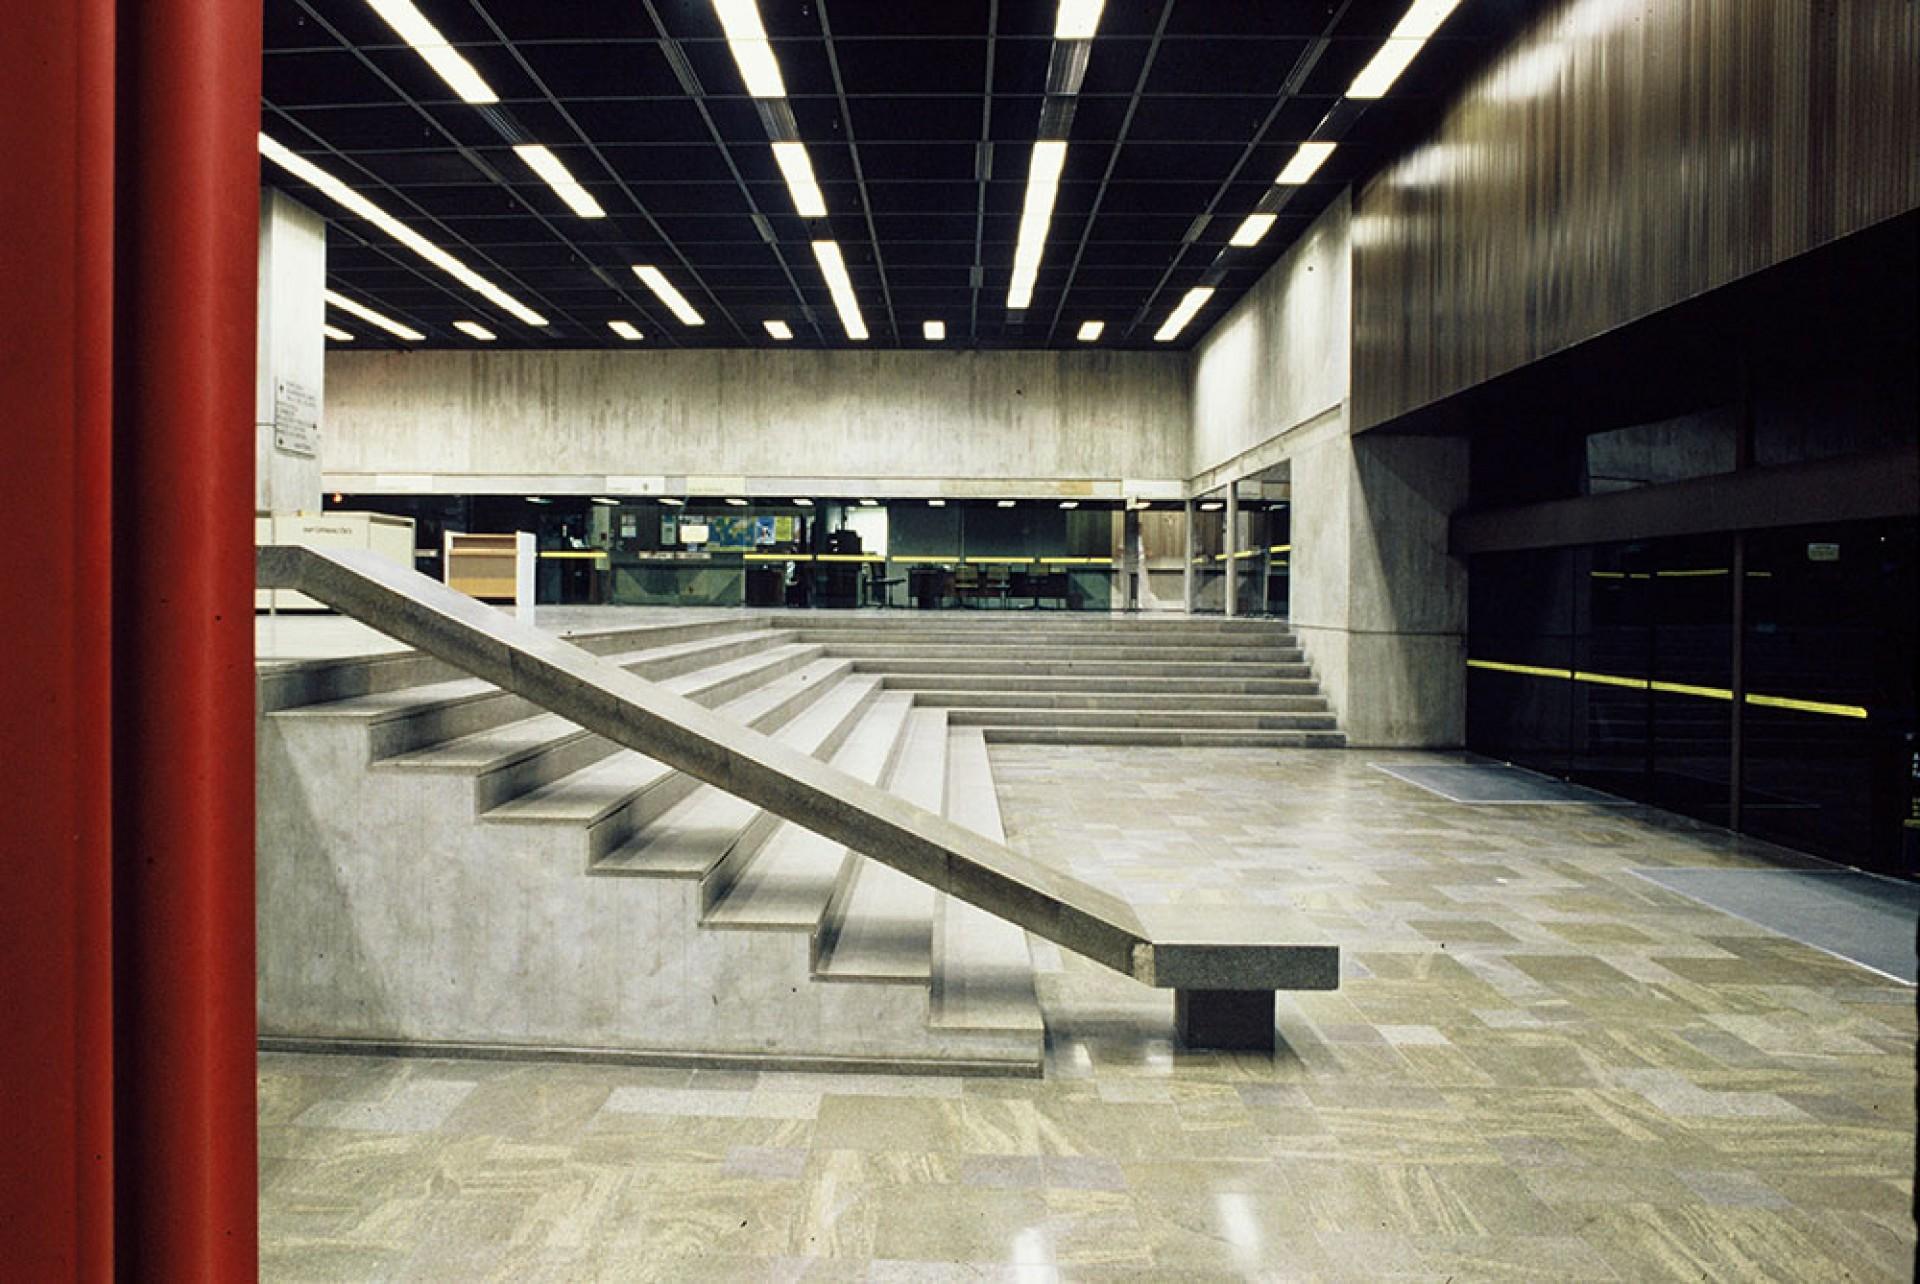 Ministério da Fazenda - Fortaleza - CE (1975)